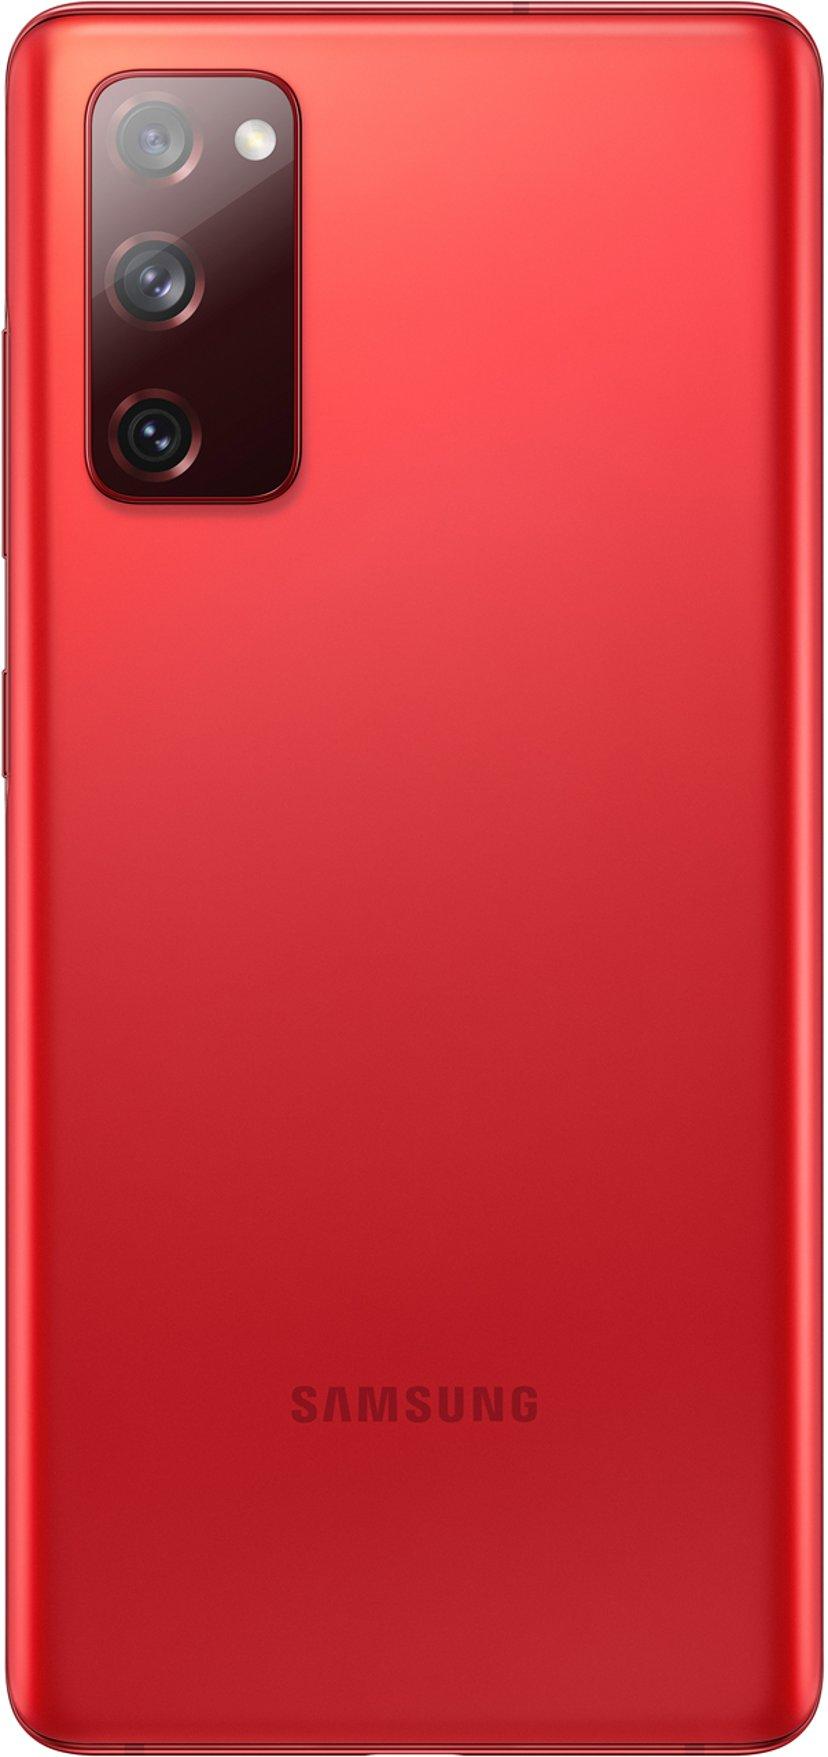 Samsung Galaxy S20 FE 5G 128GB Dual-SIM Molnrött